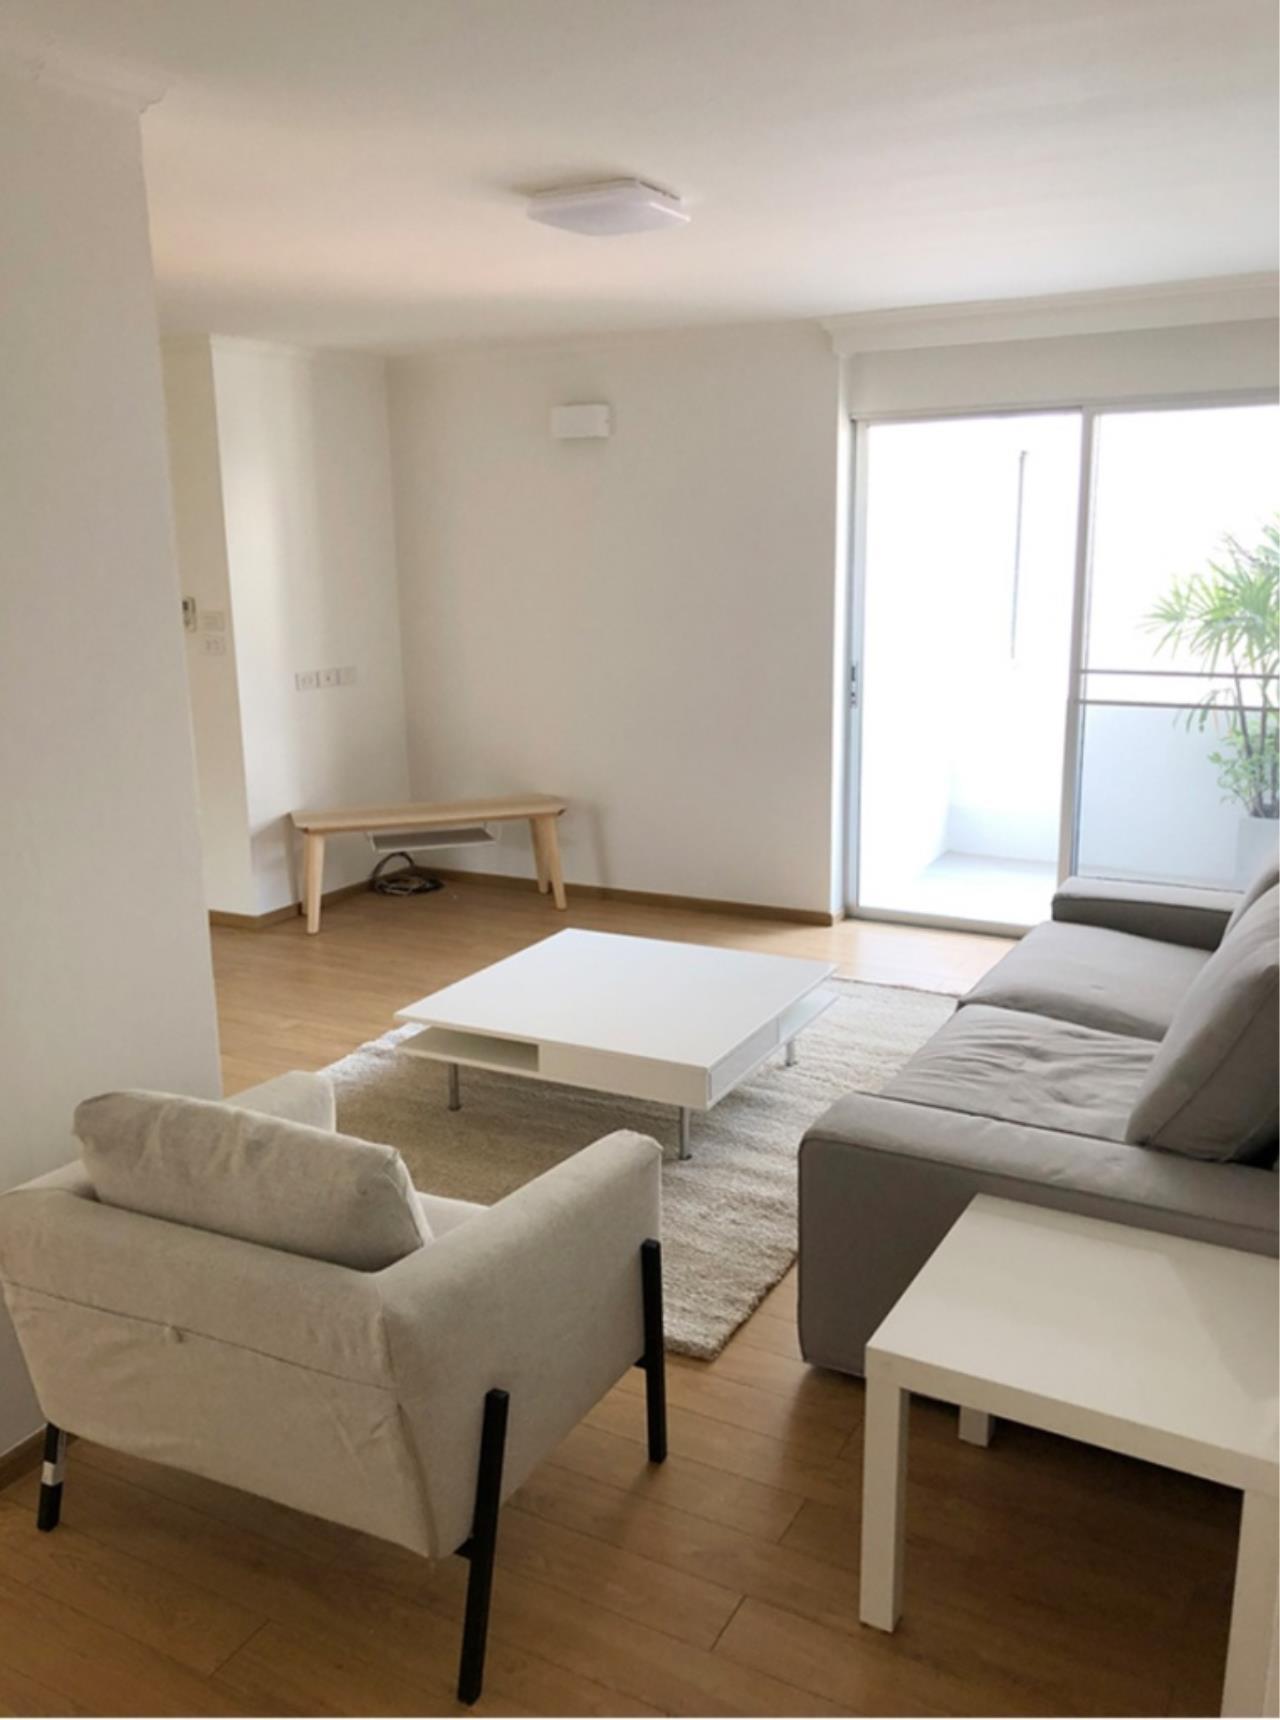 Century21 Skylux Agency's Witthayu Court / Apartment (Serviced) For Rent / 3 Bedroom / 170 SQM / BTS Phloen Chit / Bangkok 3